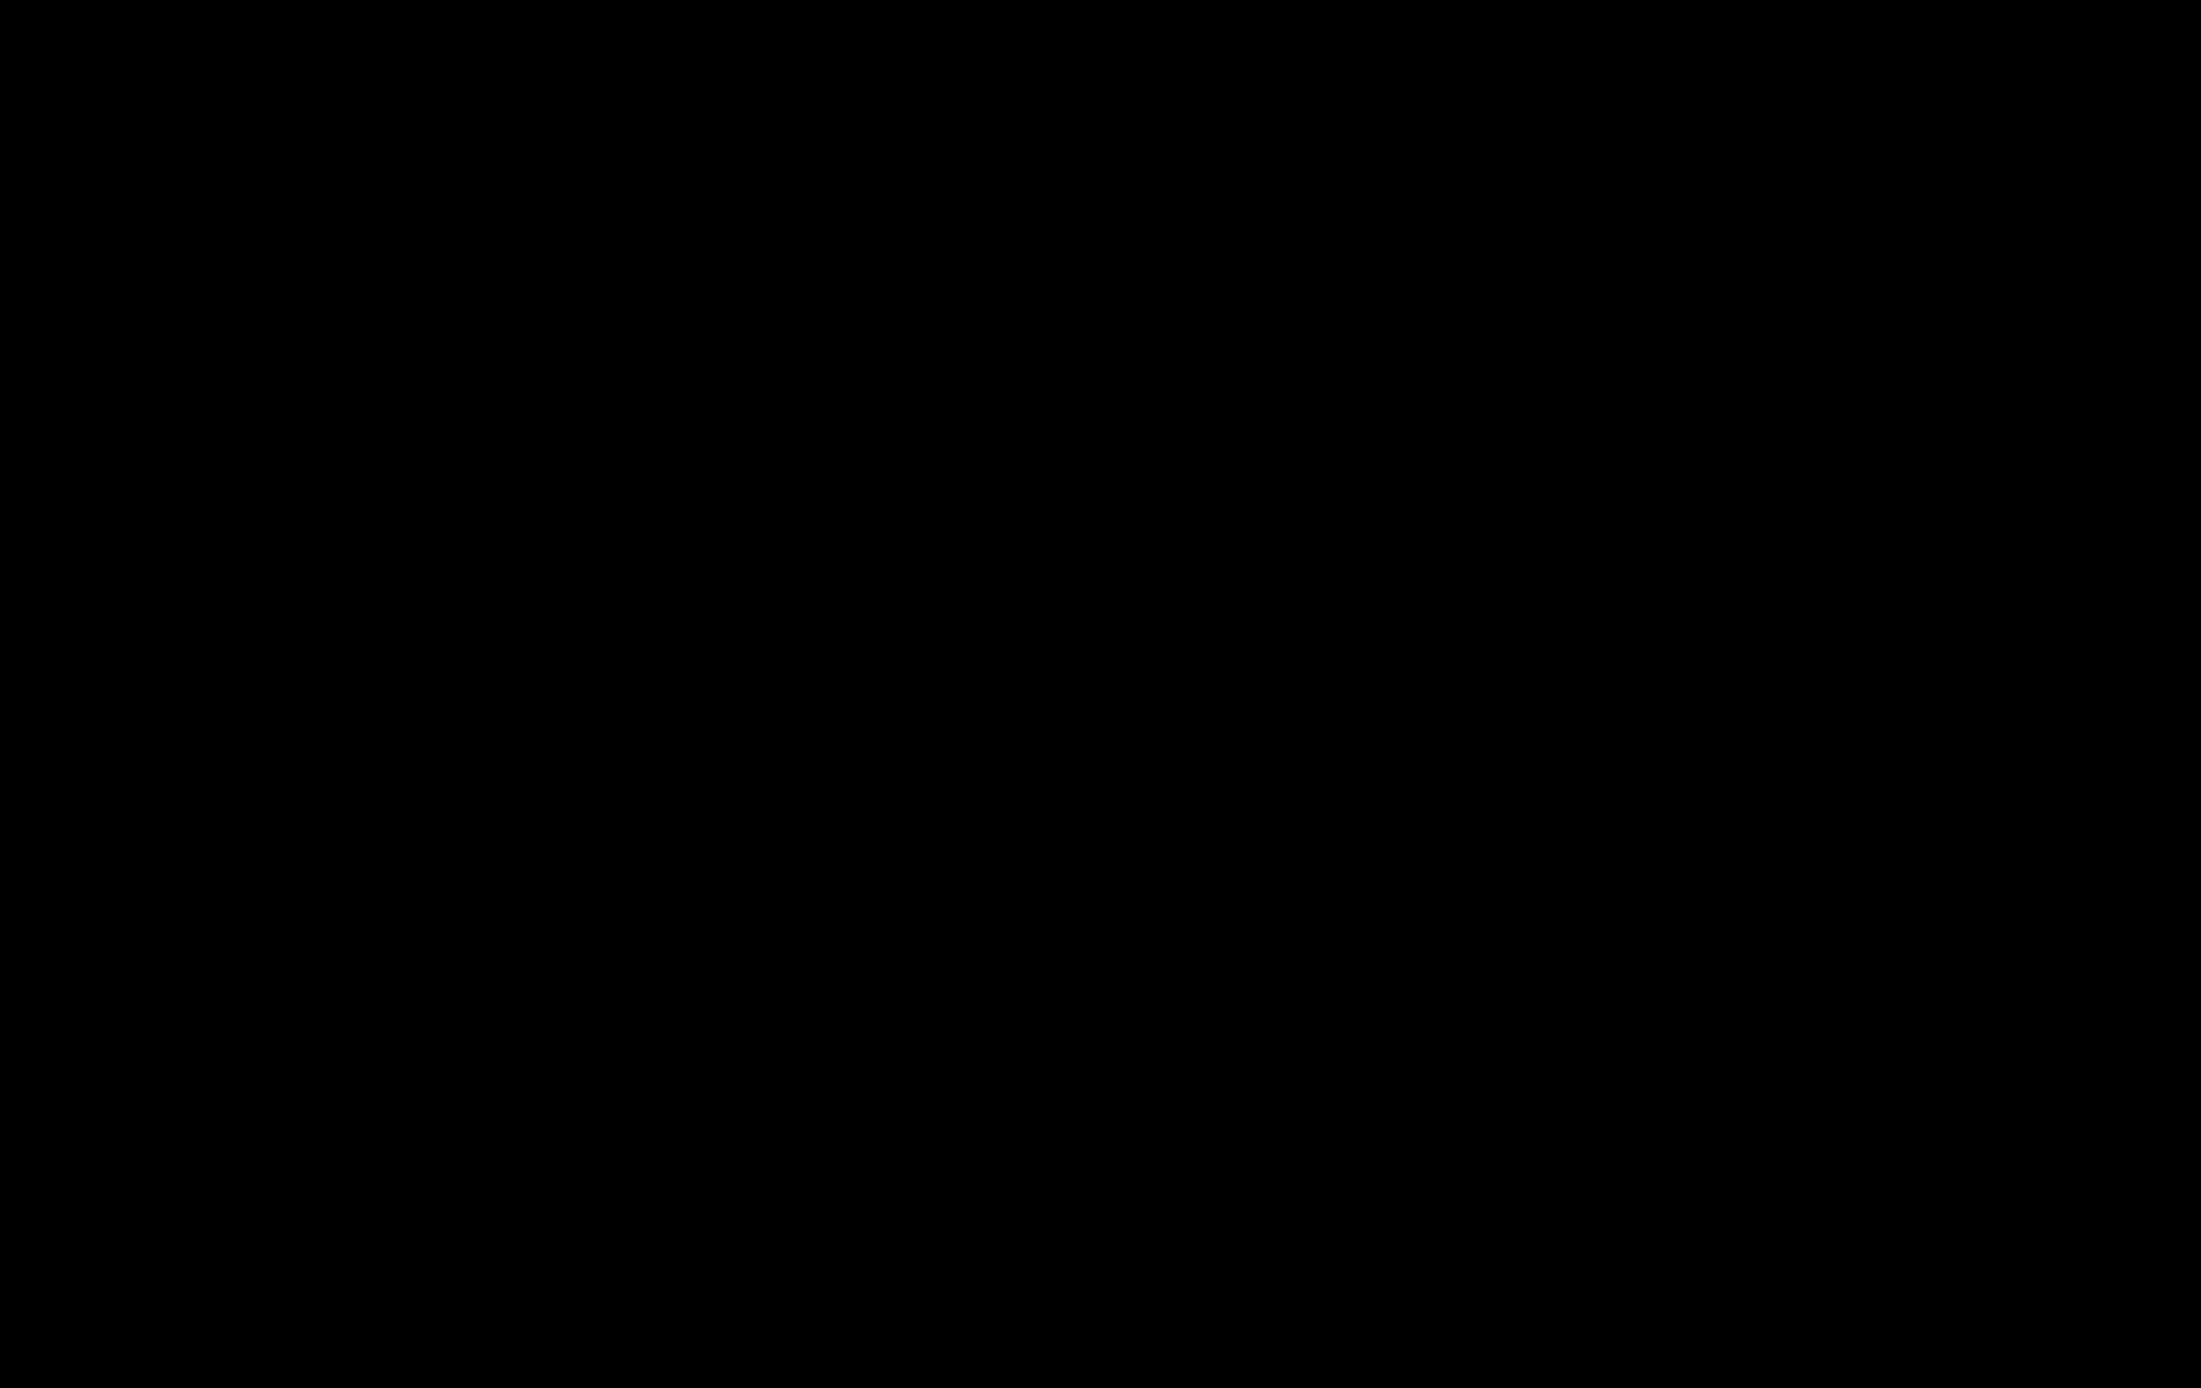 Clipart puppy svg. Dog silhouette clip art